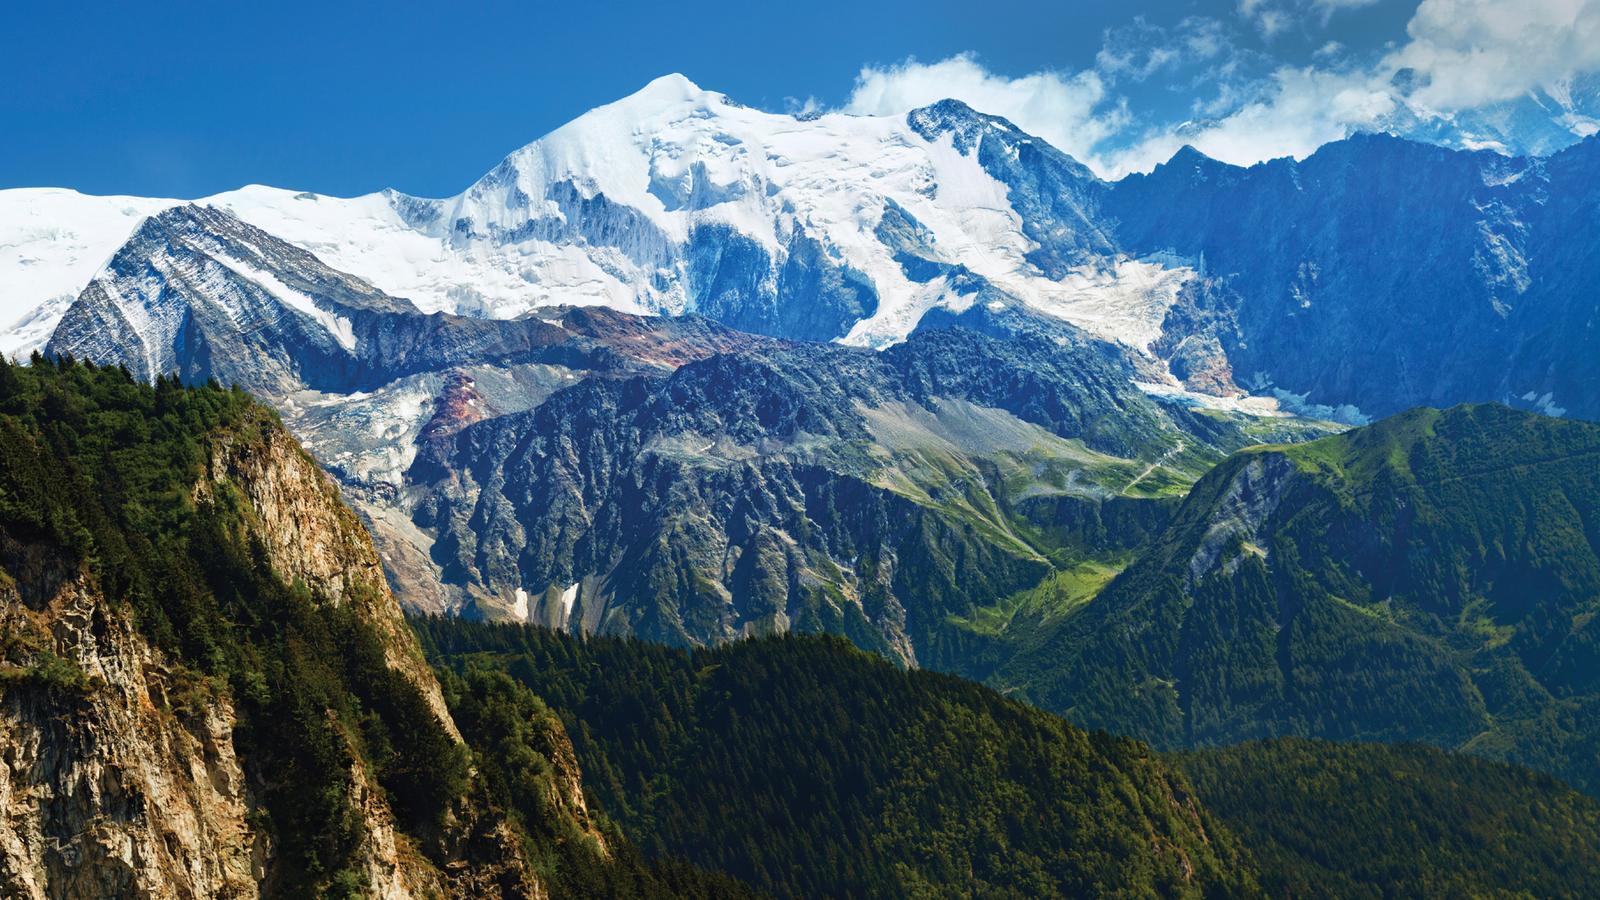 Austria Wallpaper Hd Mont Blanc Explorer In France Europe G Adventures